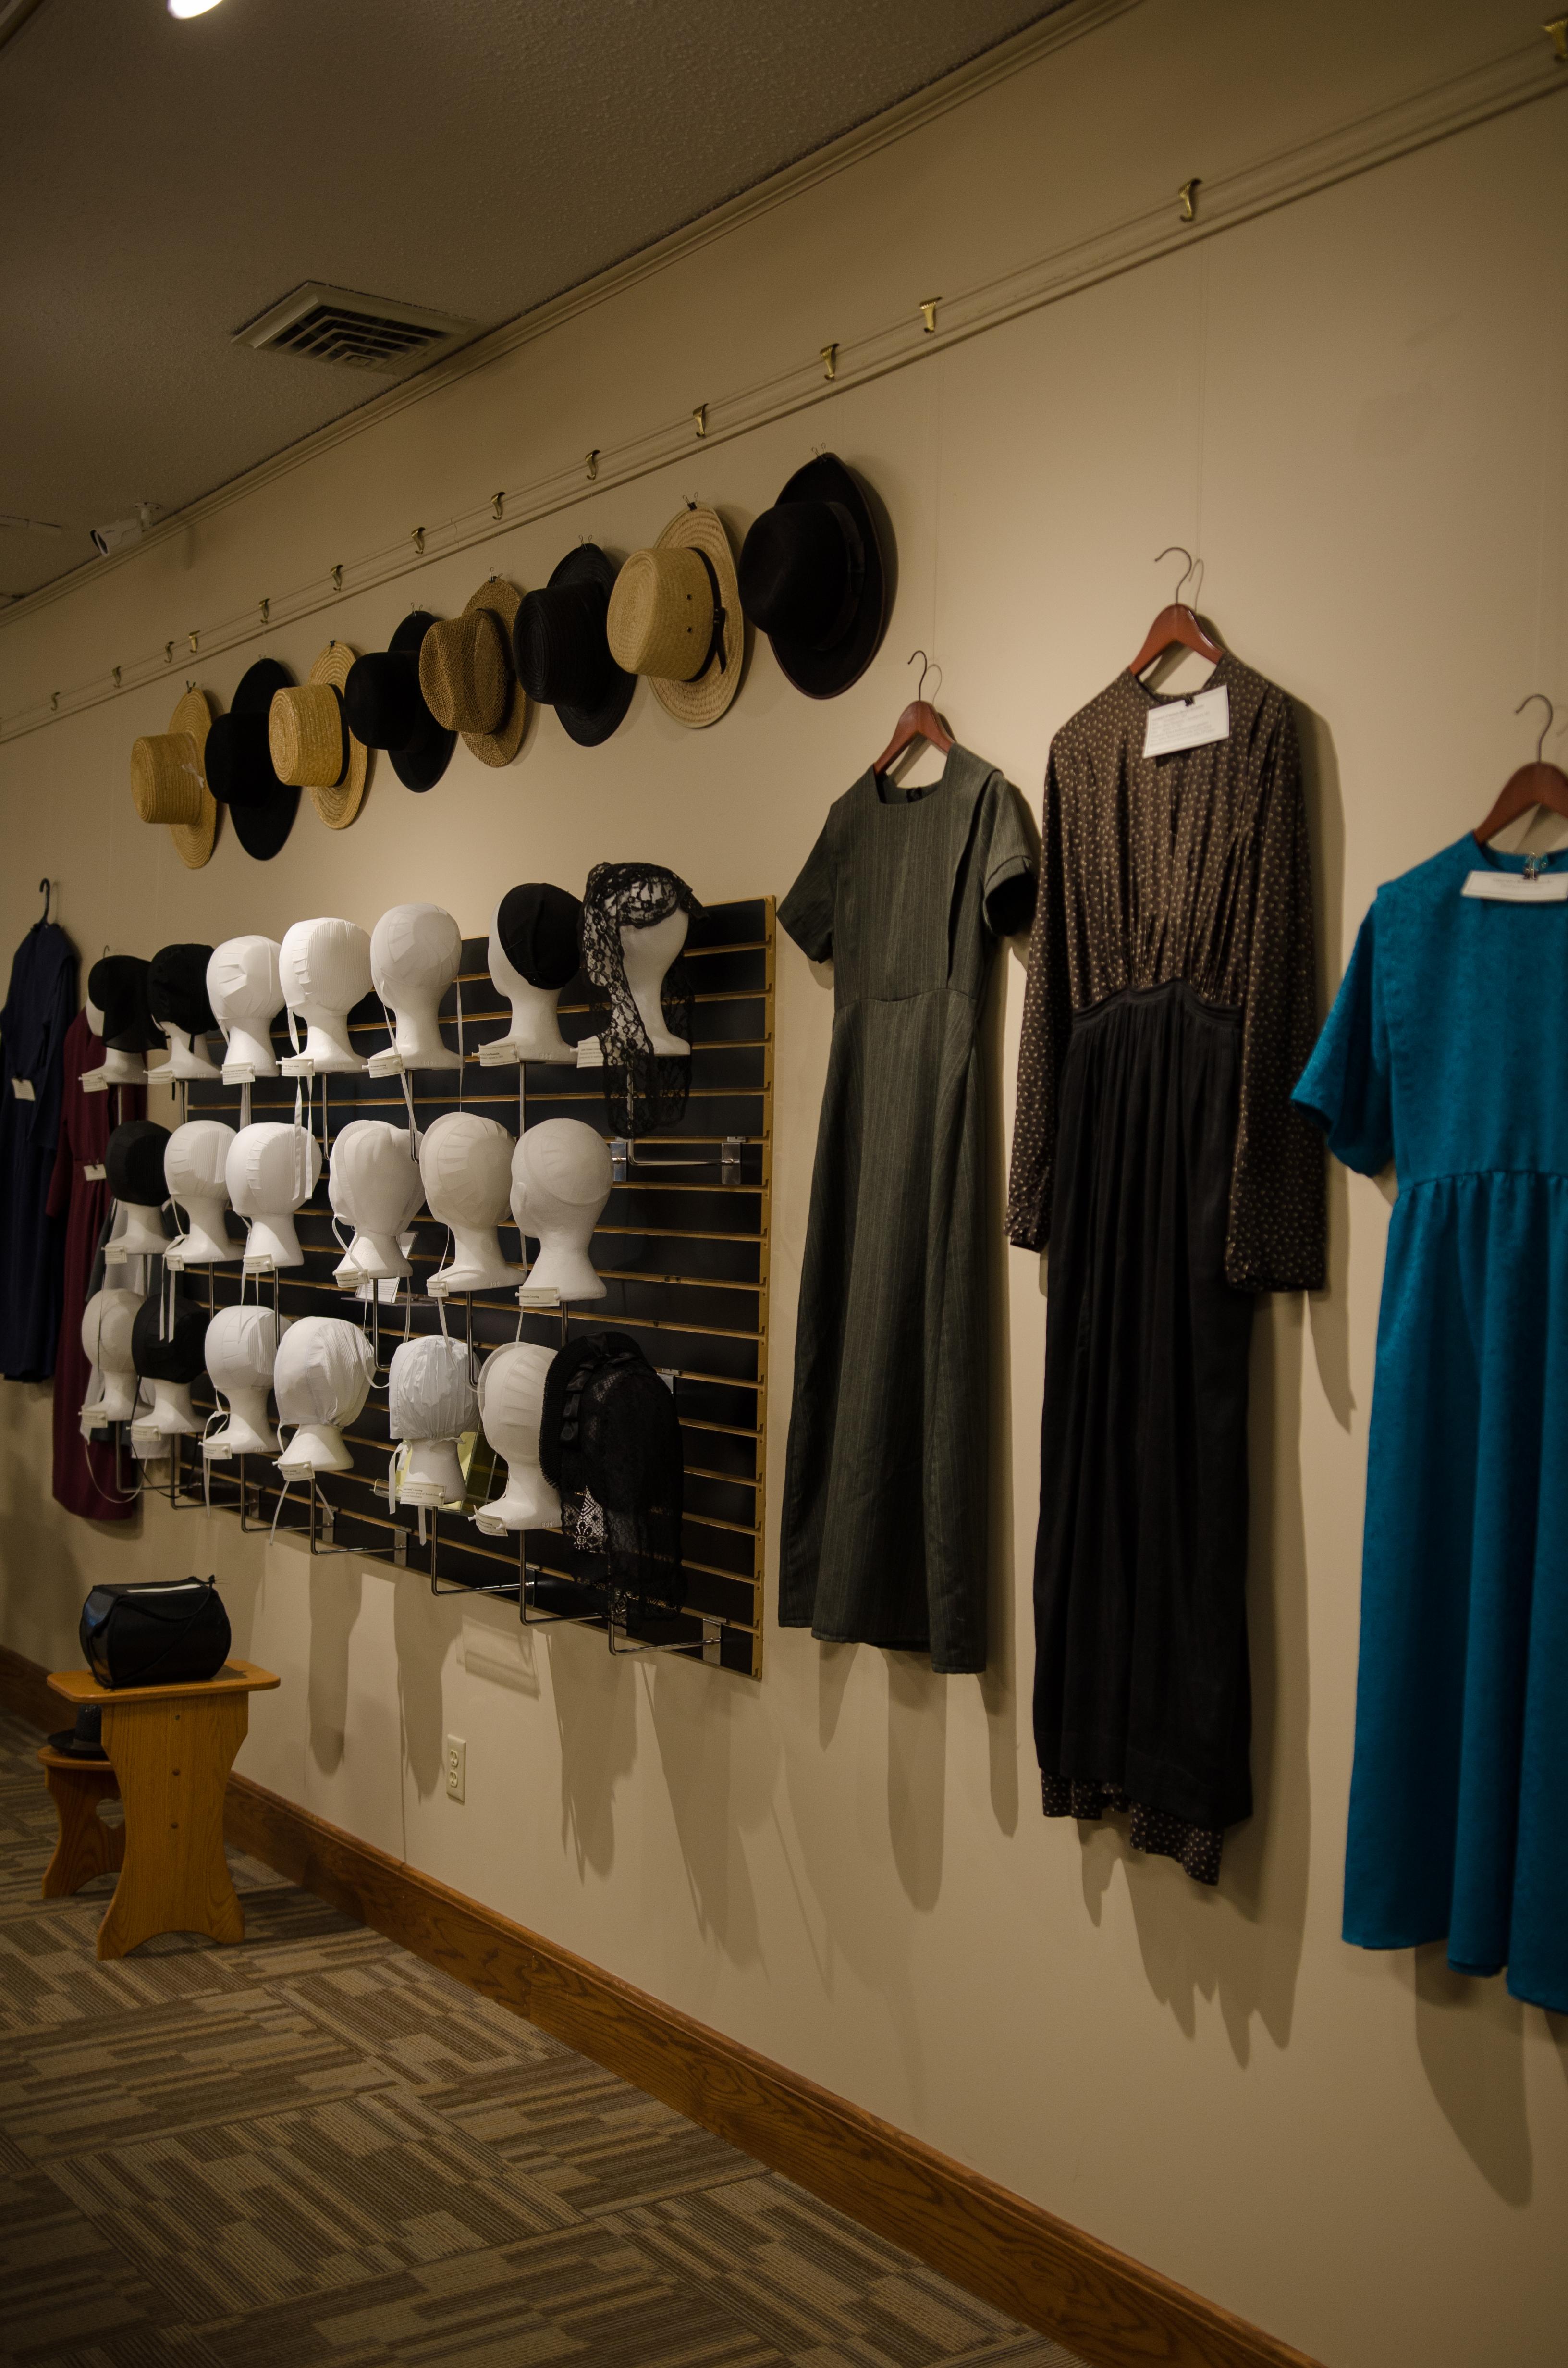 Behalt- Amish _ Mennonite Heritage Cente